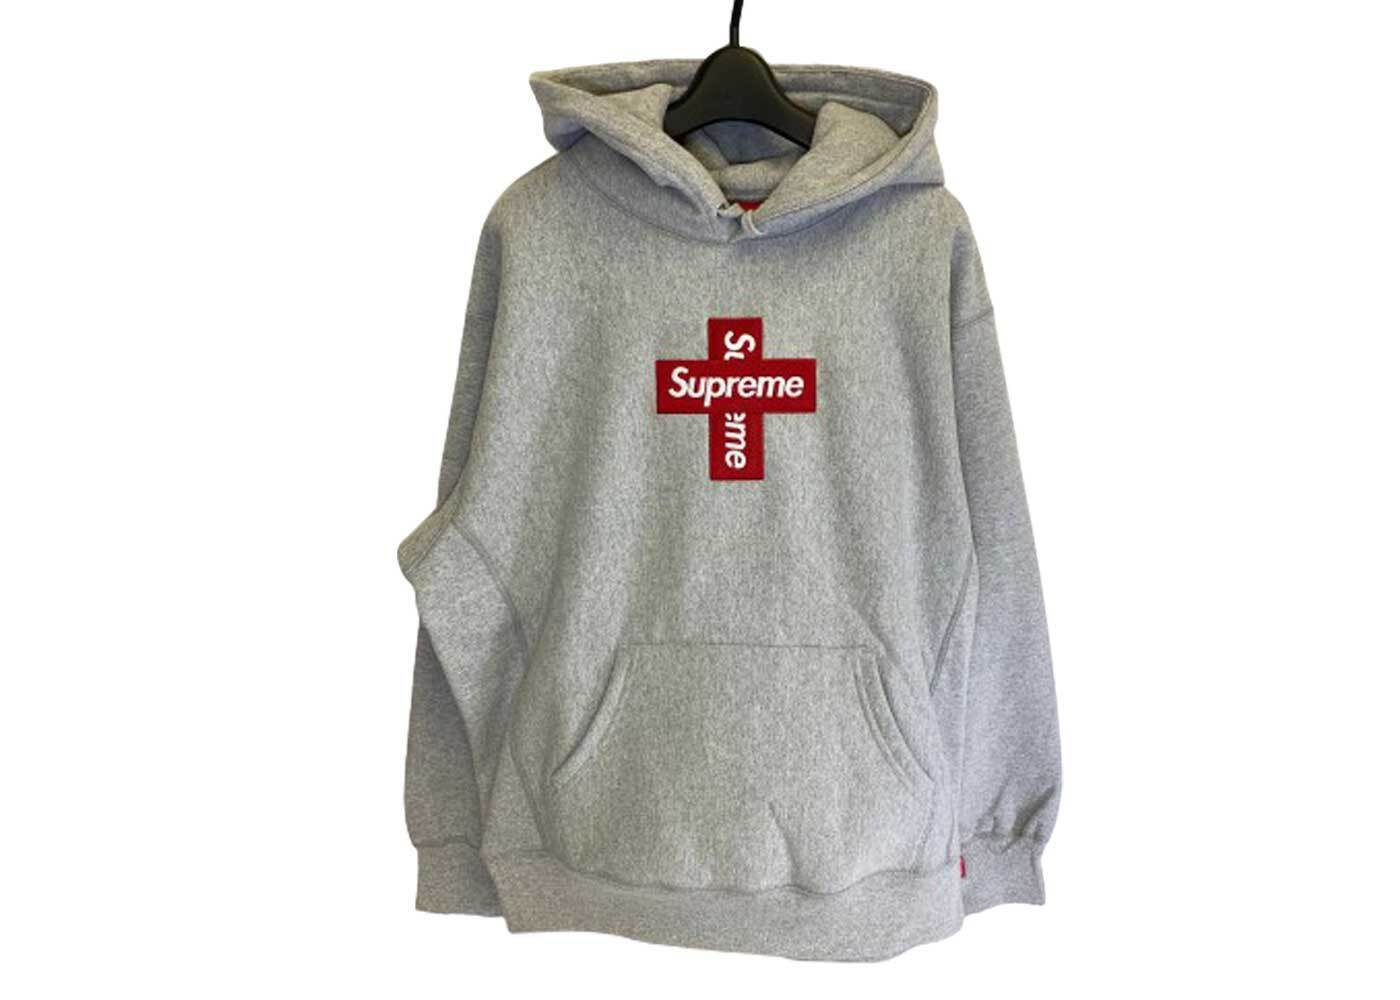 Supreme Cross Box Logo Hooded Sweatshirt Heather Greyの写真